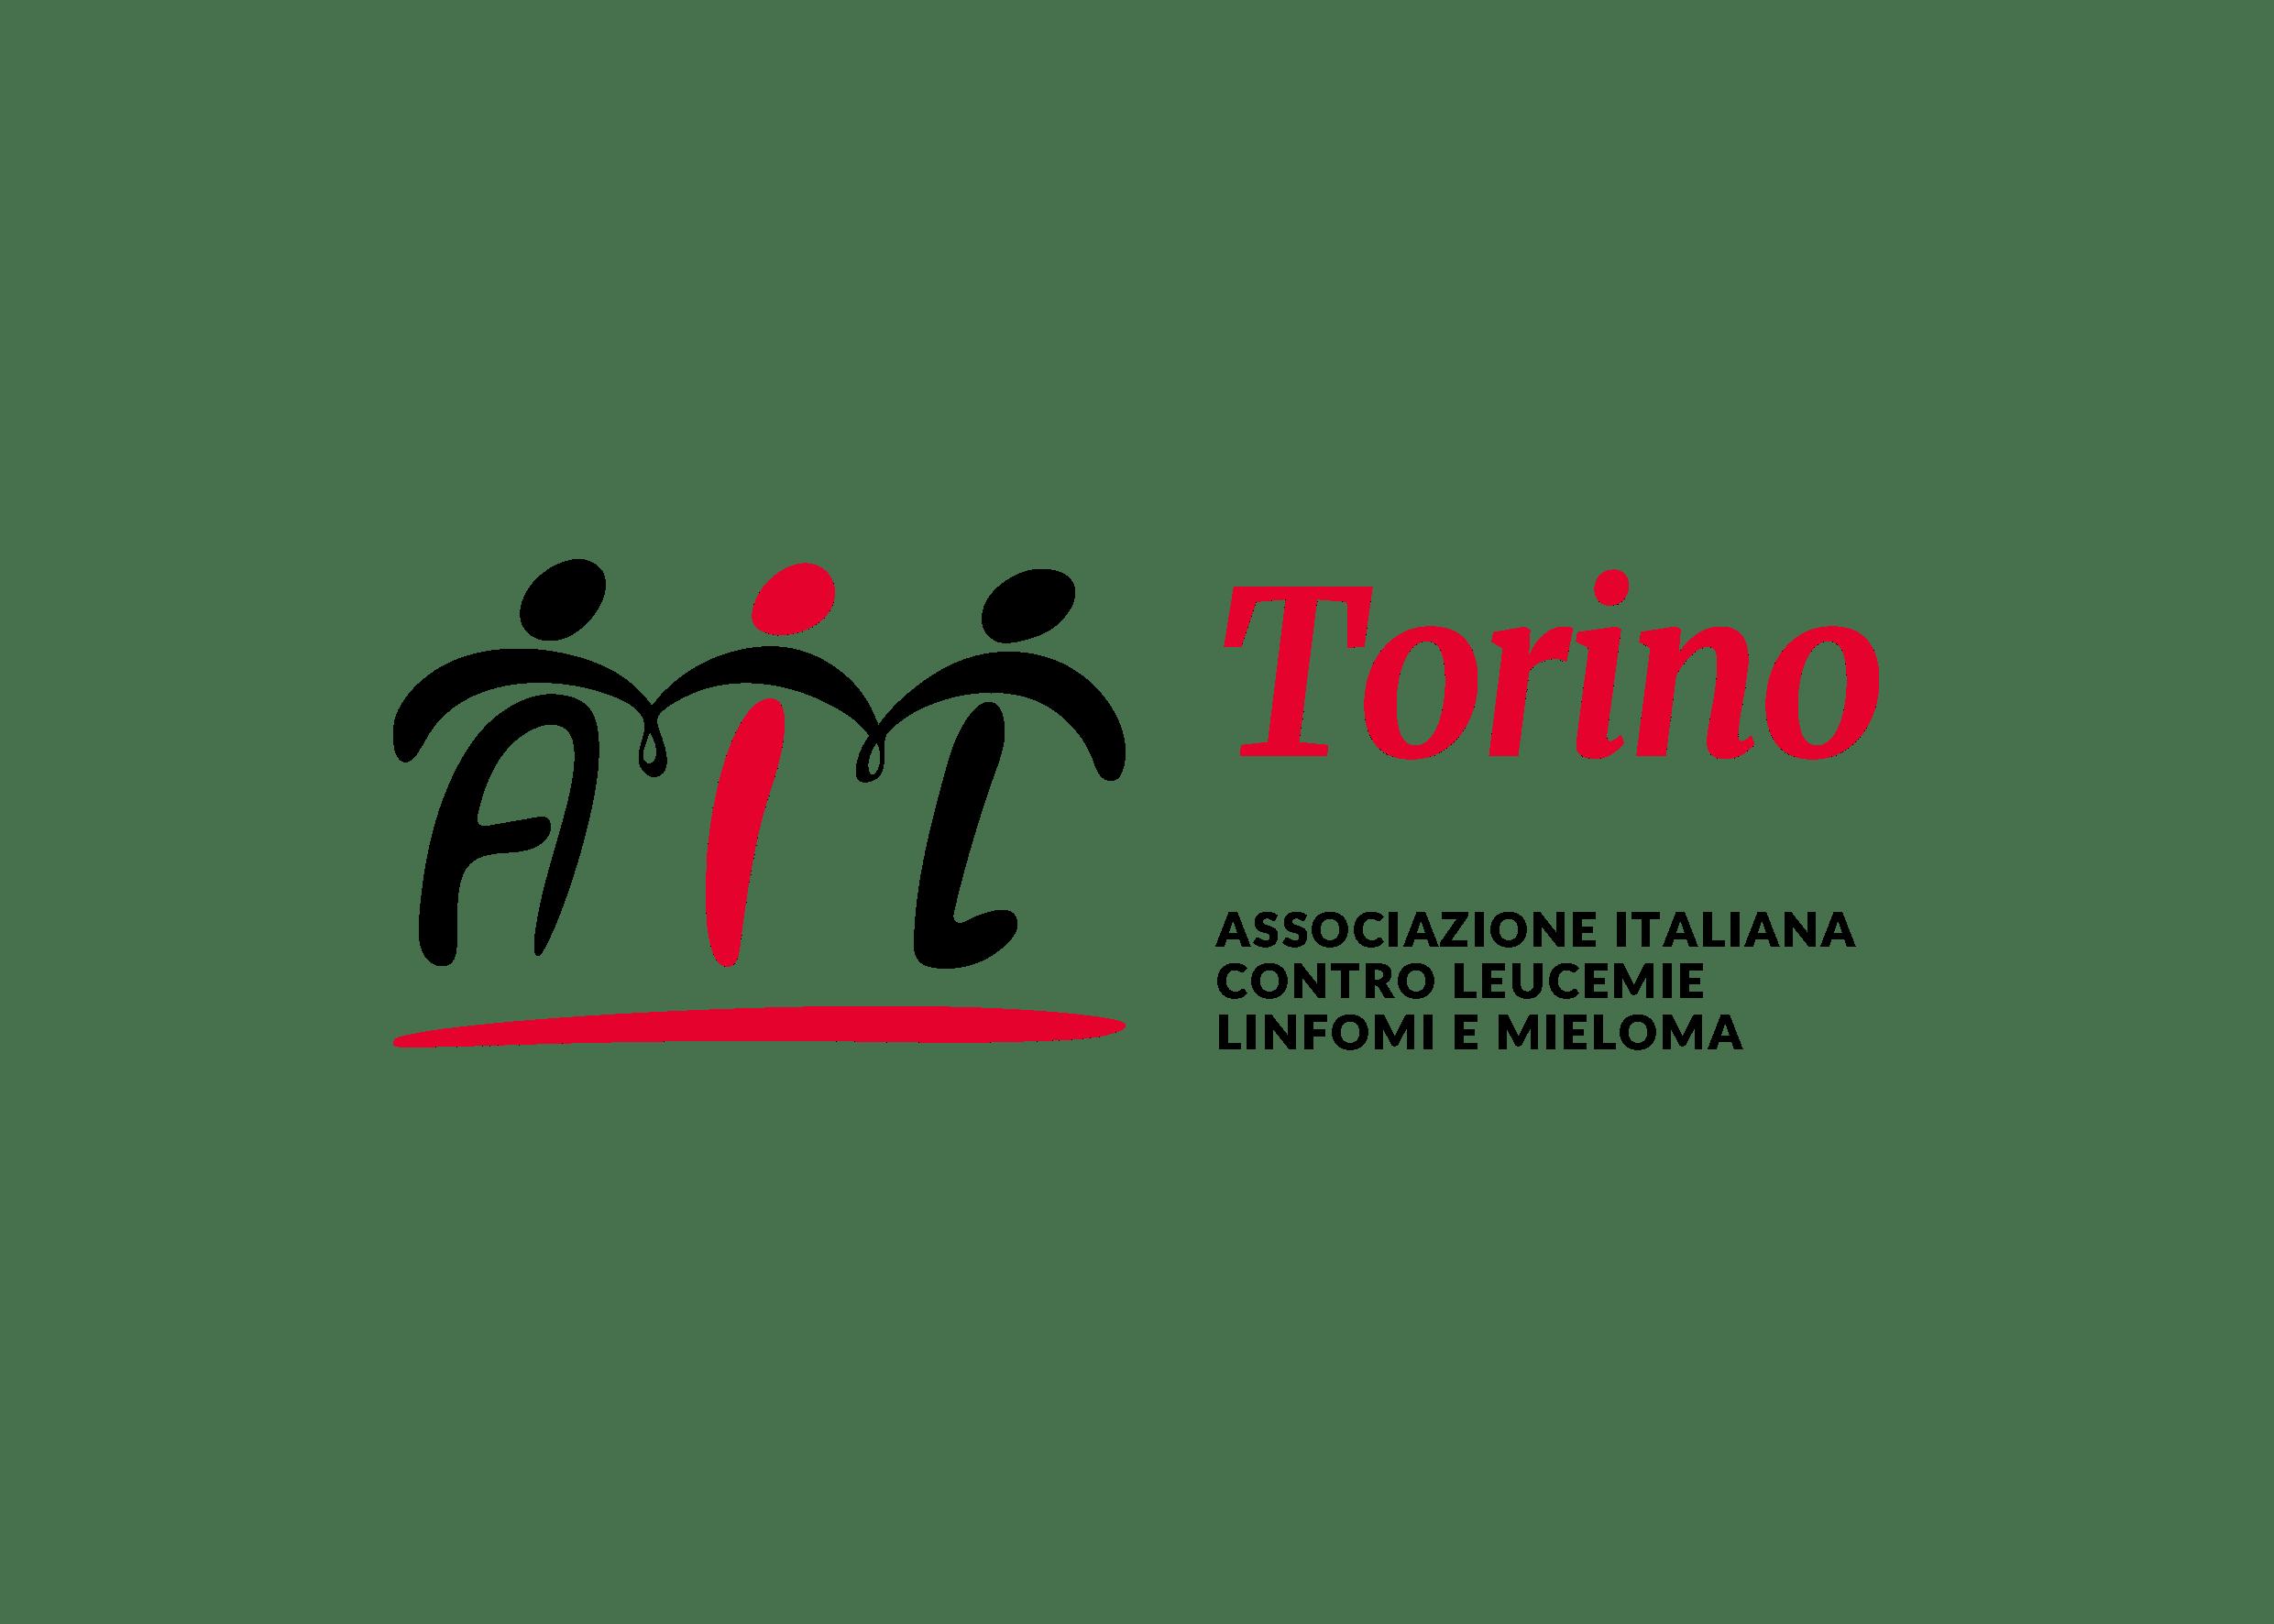 Shop AIL Torino